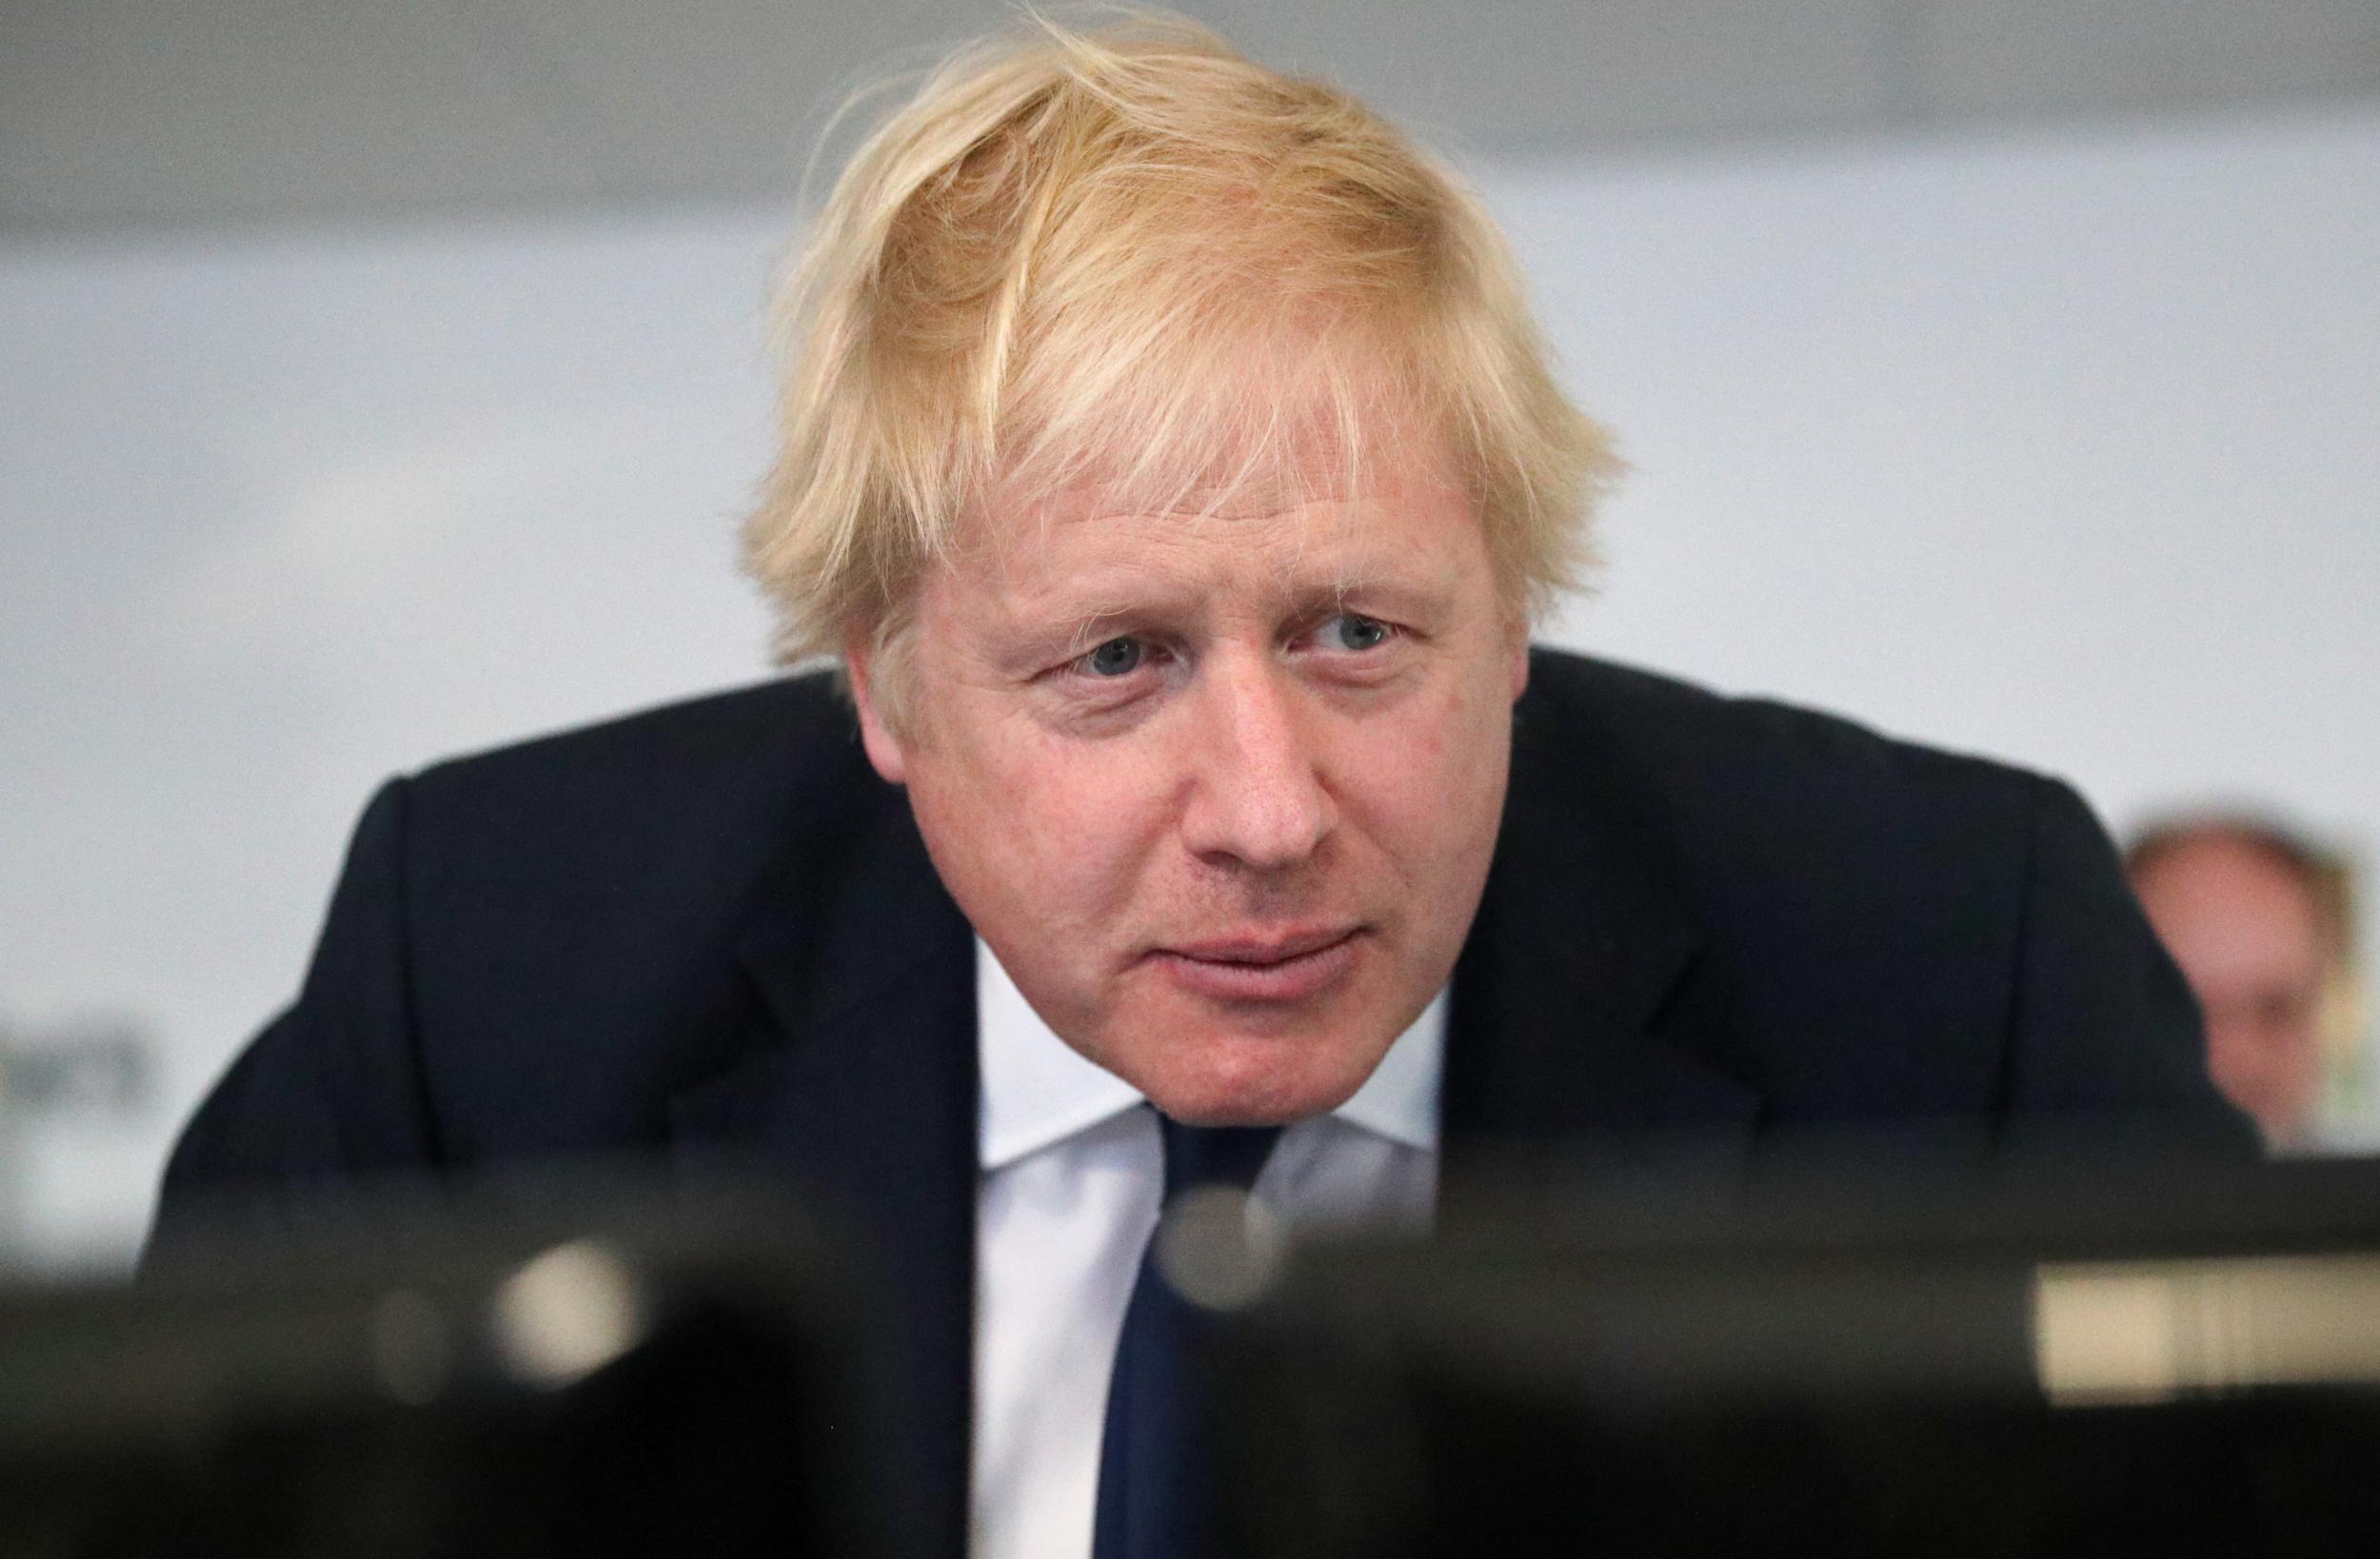 Cassetteboy releases Boris Johnson Brexit mashup 'Can't Trust Me'